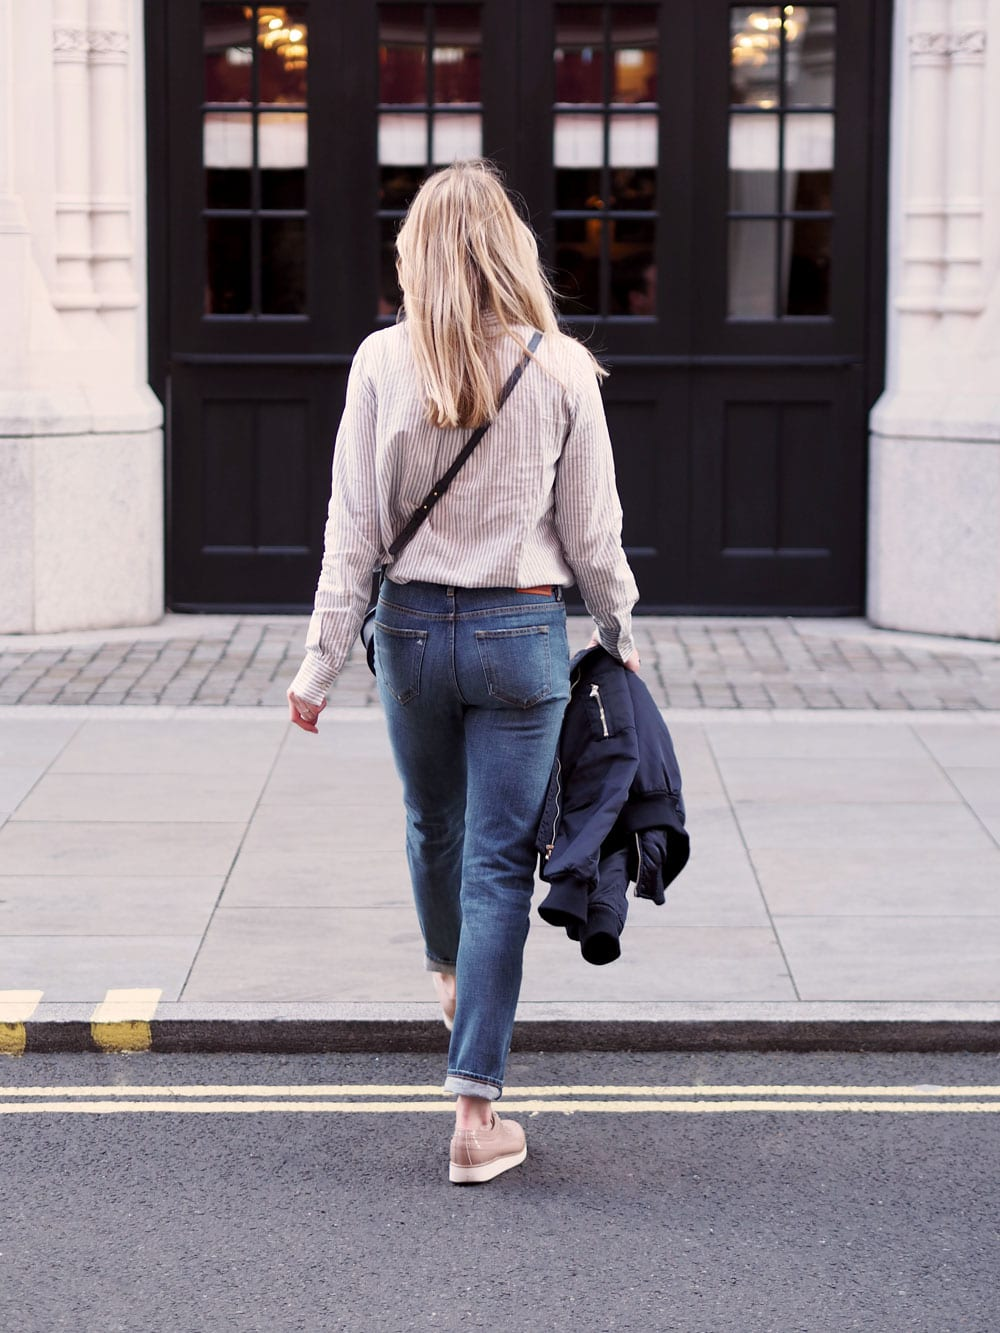 Style&Minimalism | It's Personal | Stripe Shirts & Denim | Samsøe Jeans, Topshop Bomber, Second Female Shirt, Triwa Sunglasses, PB 0110 Bag